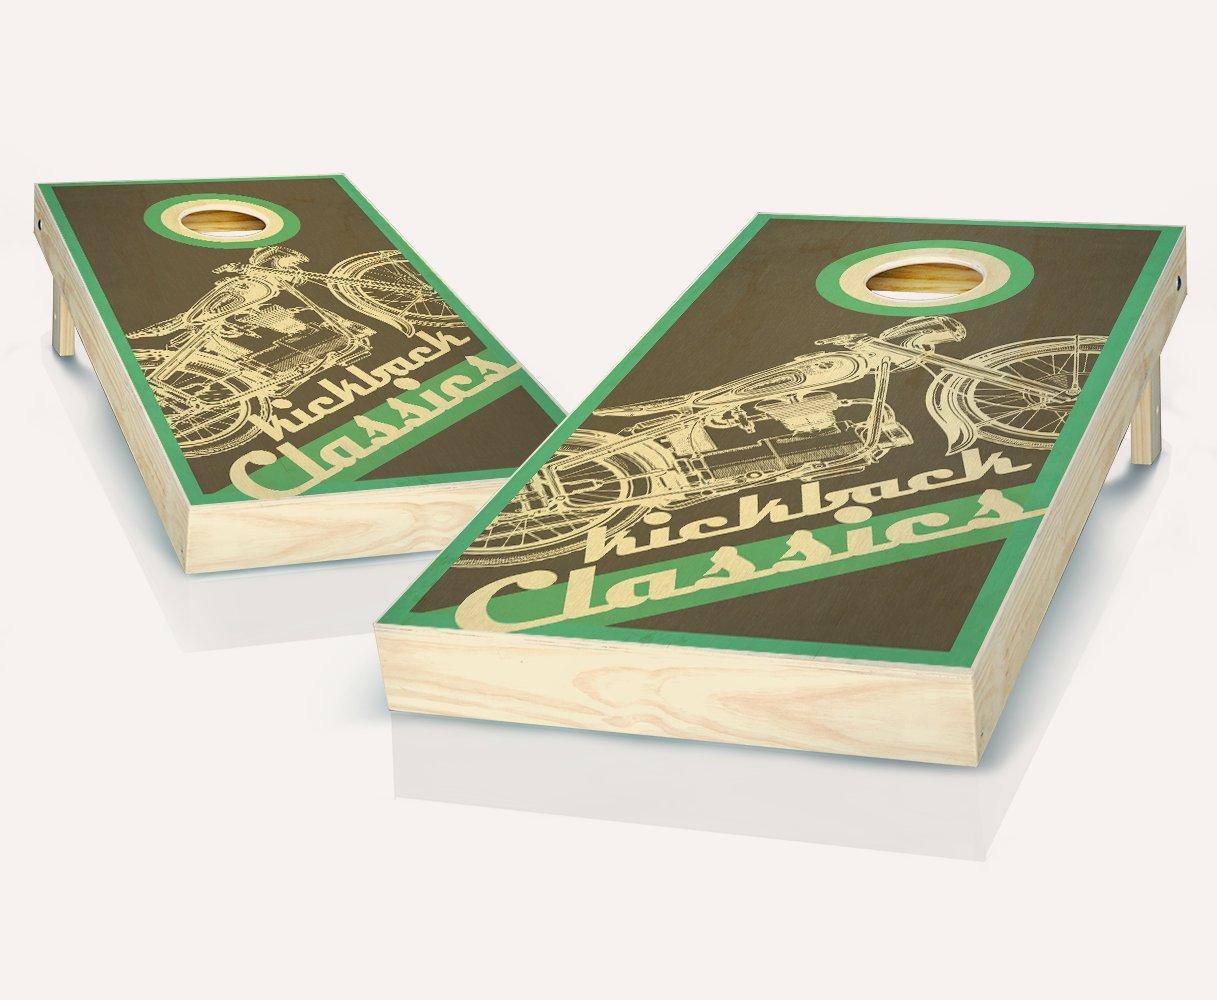 Tailgating Pros Kickback Classics Stained Kickback Cornhole Boards withのセット8 Tailgating Cornhole Boards Bags B07C8MX793, ナジェール:836ed927 --- webshop.mrf.se